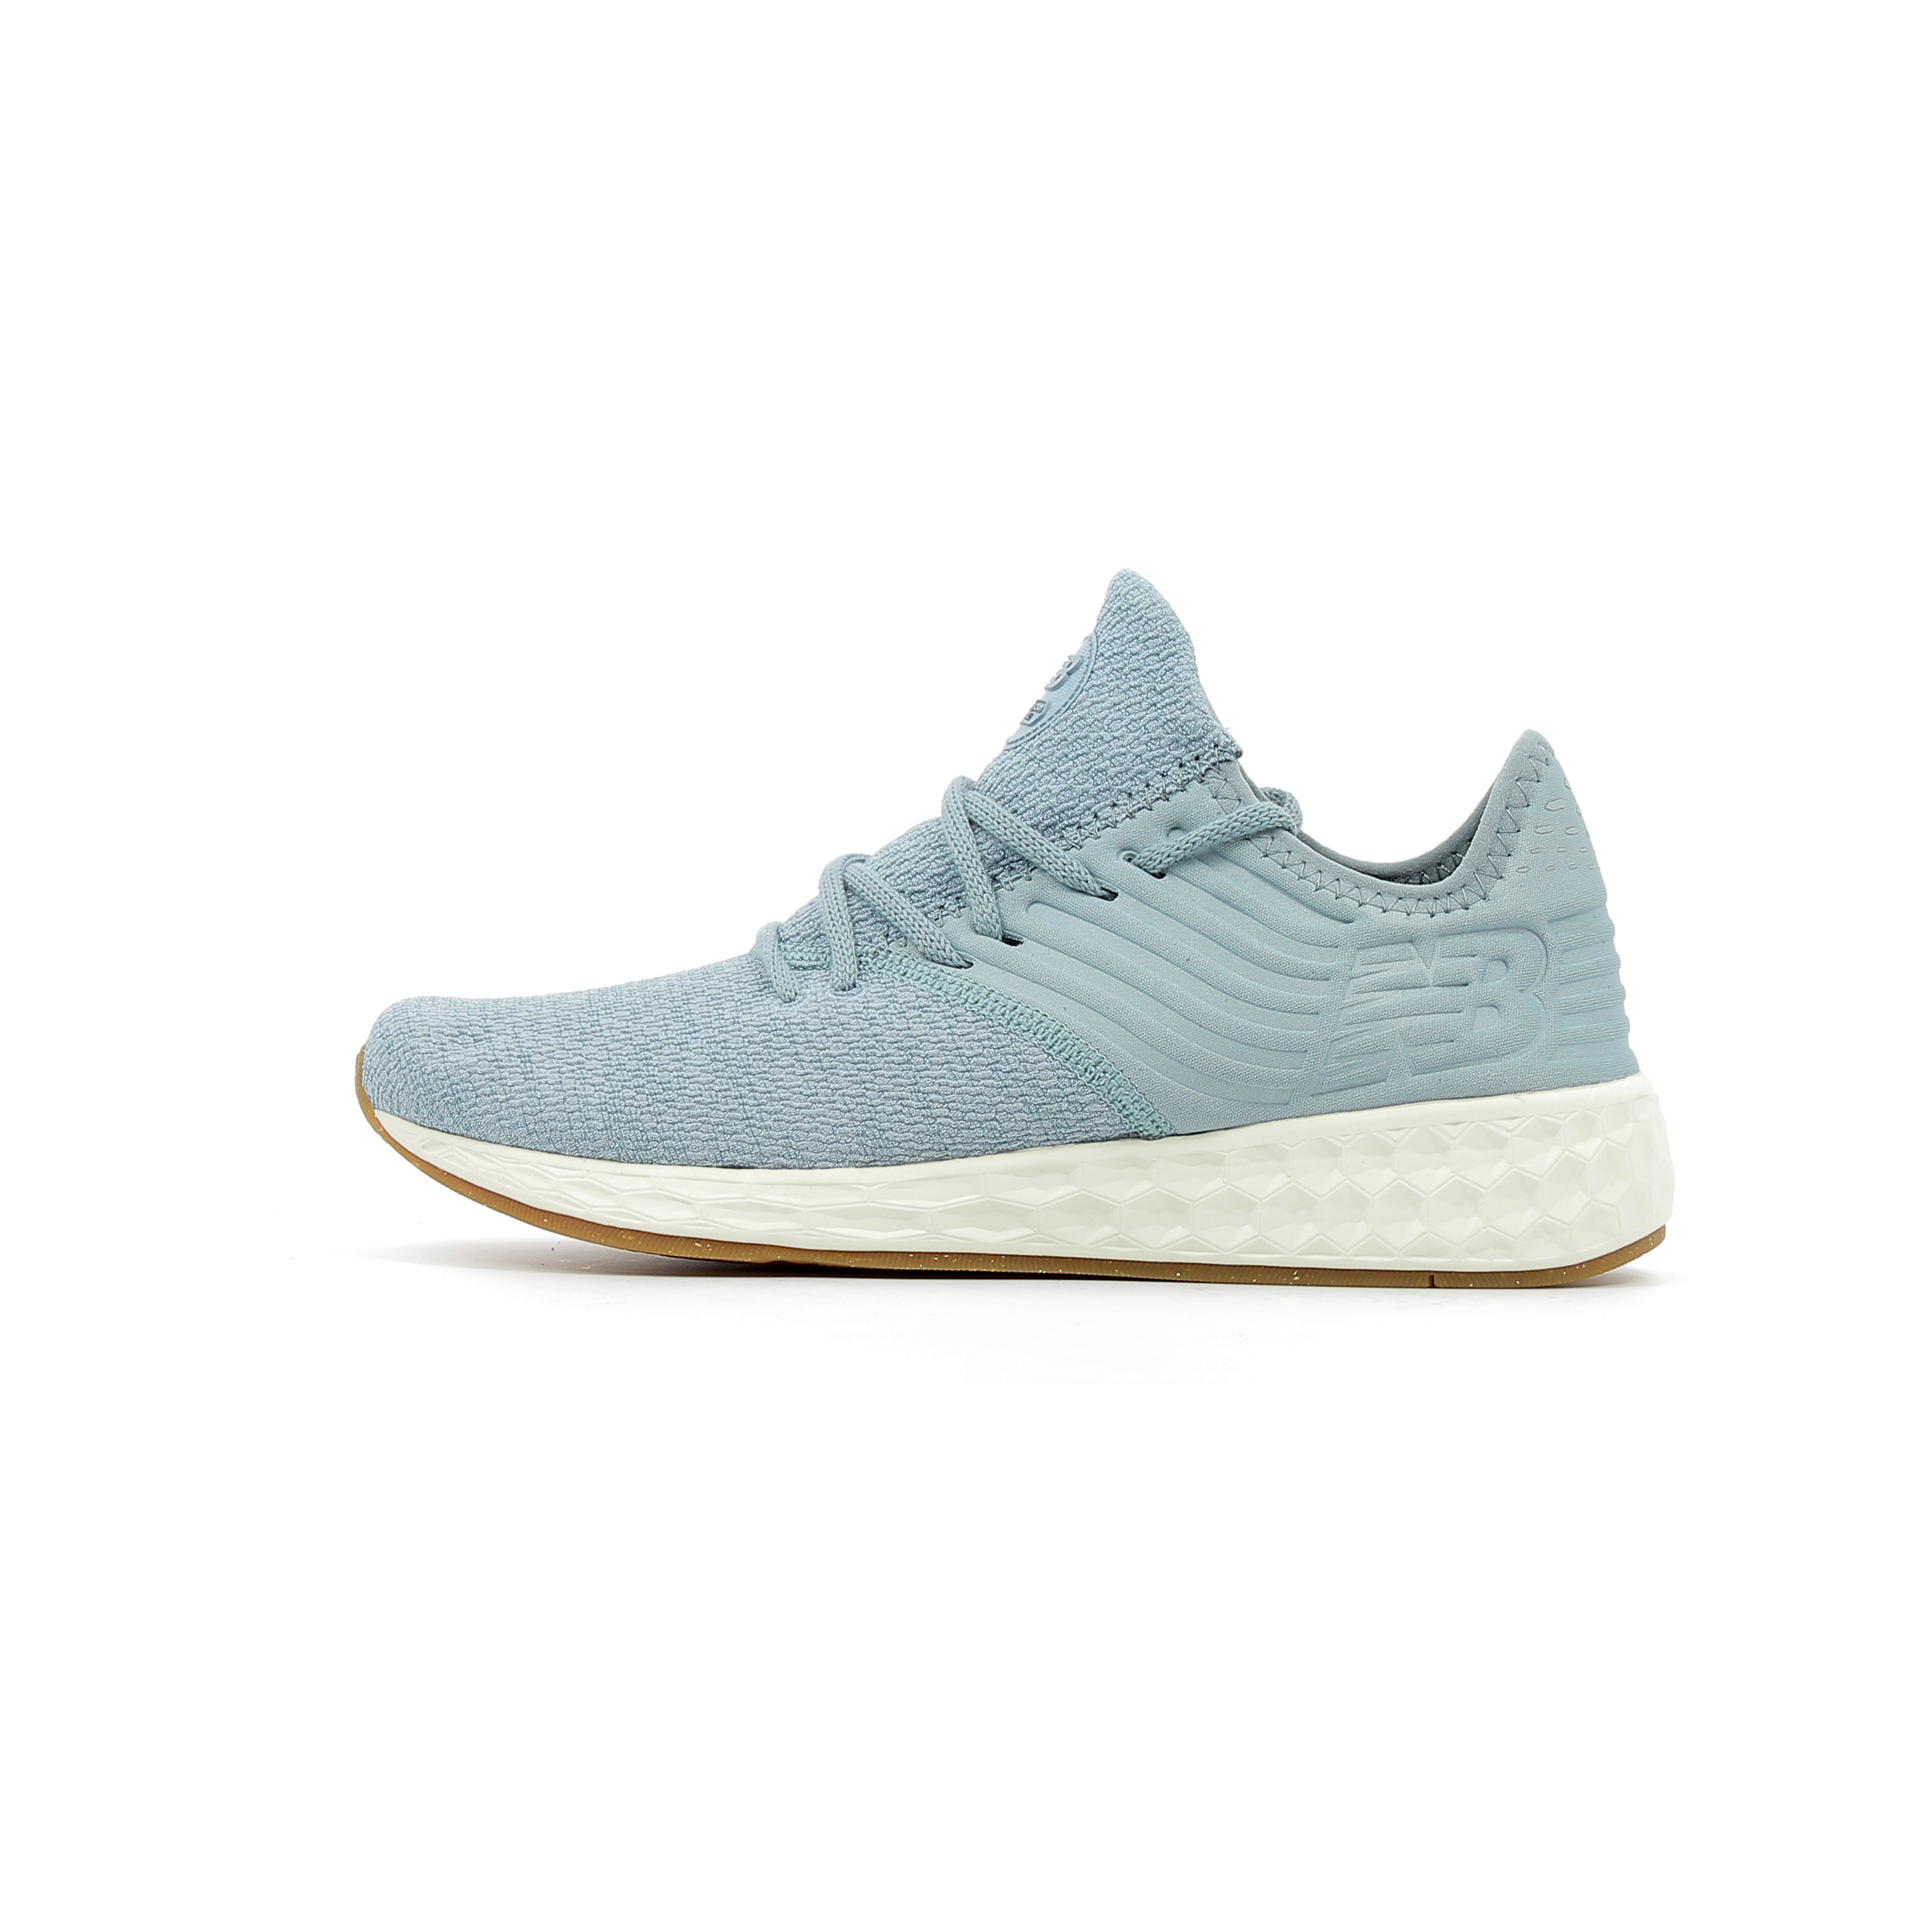 buy popular 89930 59592 Decon Fresh New Women Balance Chaussures Cruz de running Foam x0qzTz